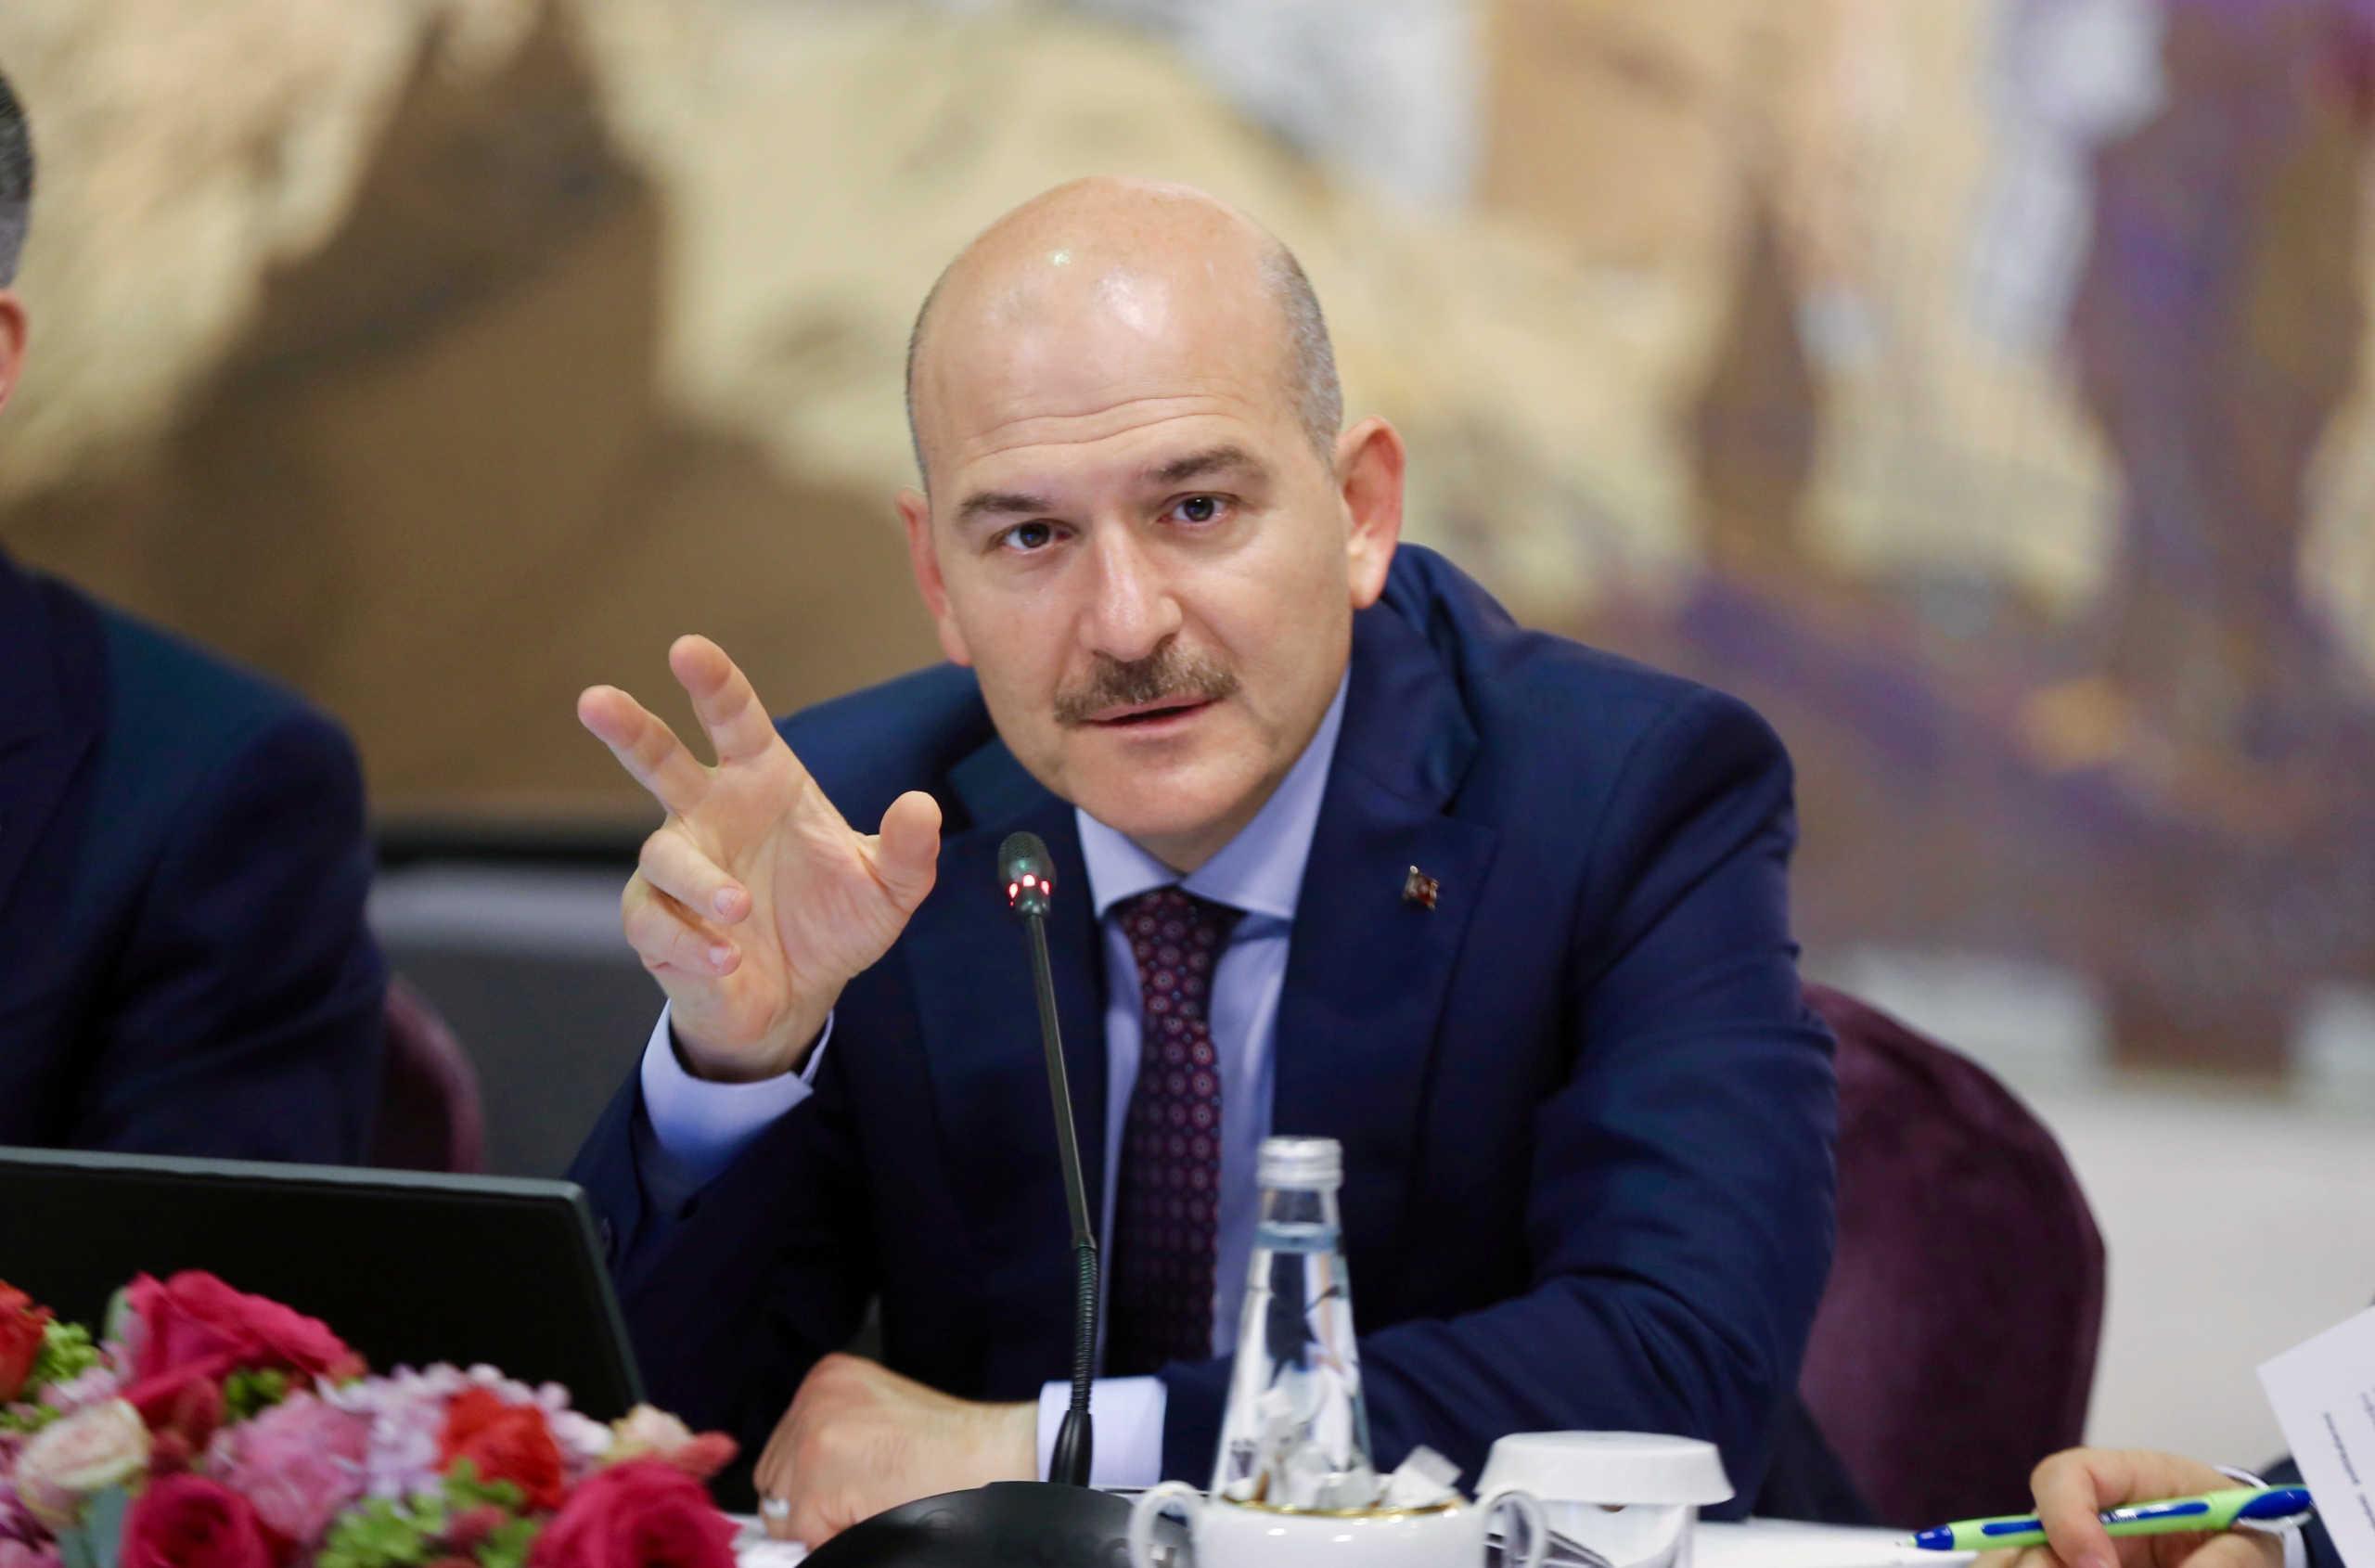 Cumhuriyet: Έρευνα εναντίον Τούρκων πολιτών επειδή αποκάλεσαν τον Σοϊλού…φαλακρό!